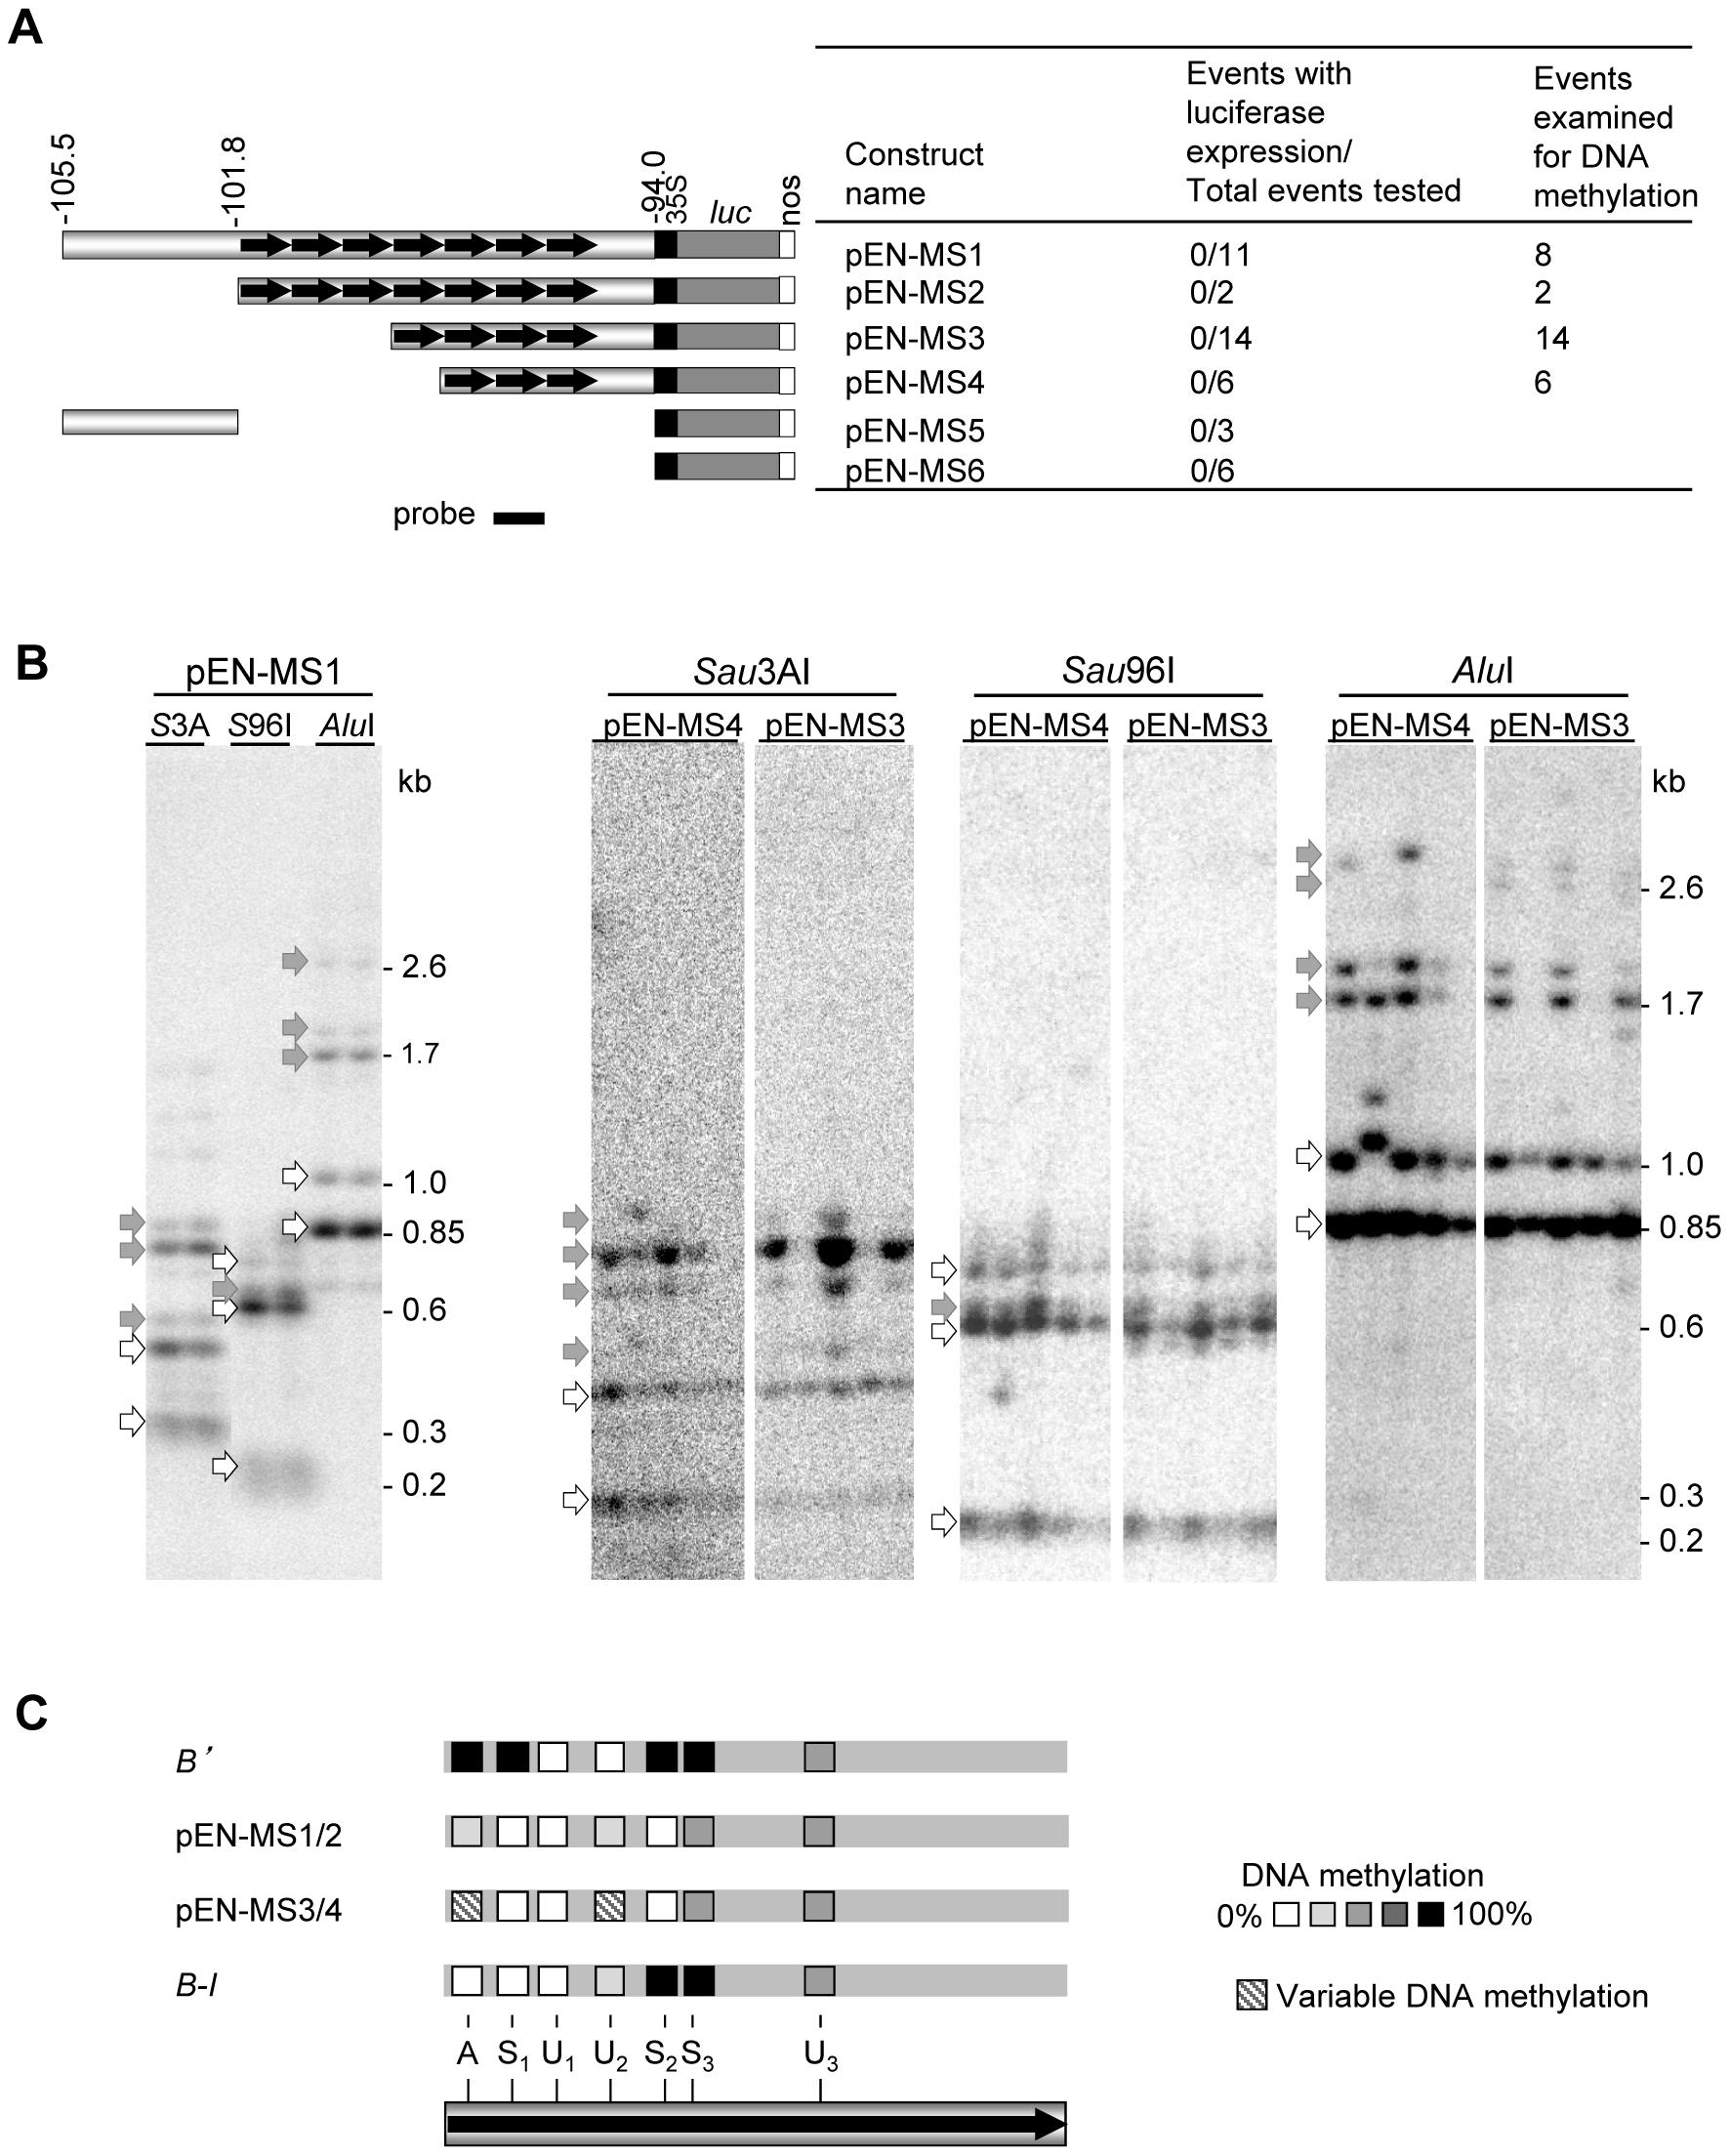 DNA methylation of maize <i>b1</i> repeats in <i>Arabidopsis</i>.